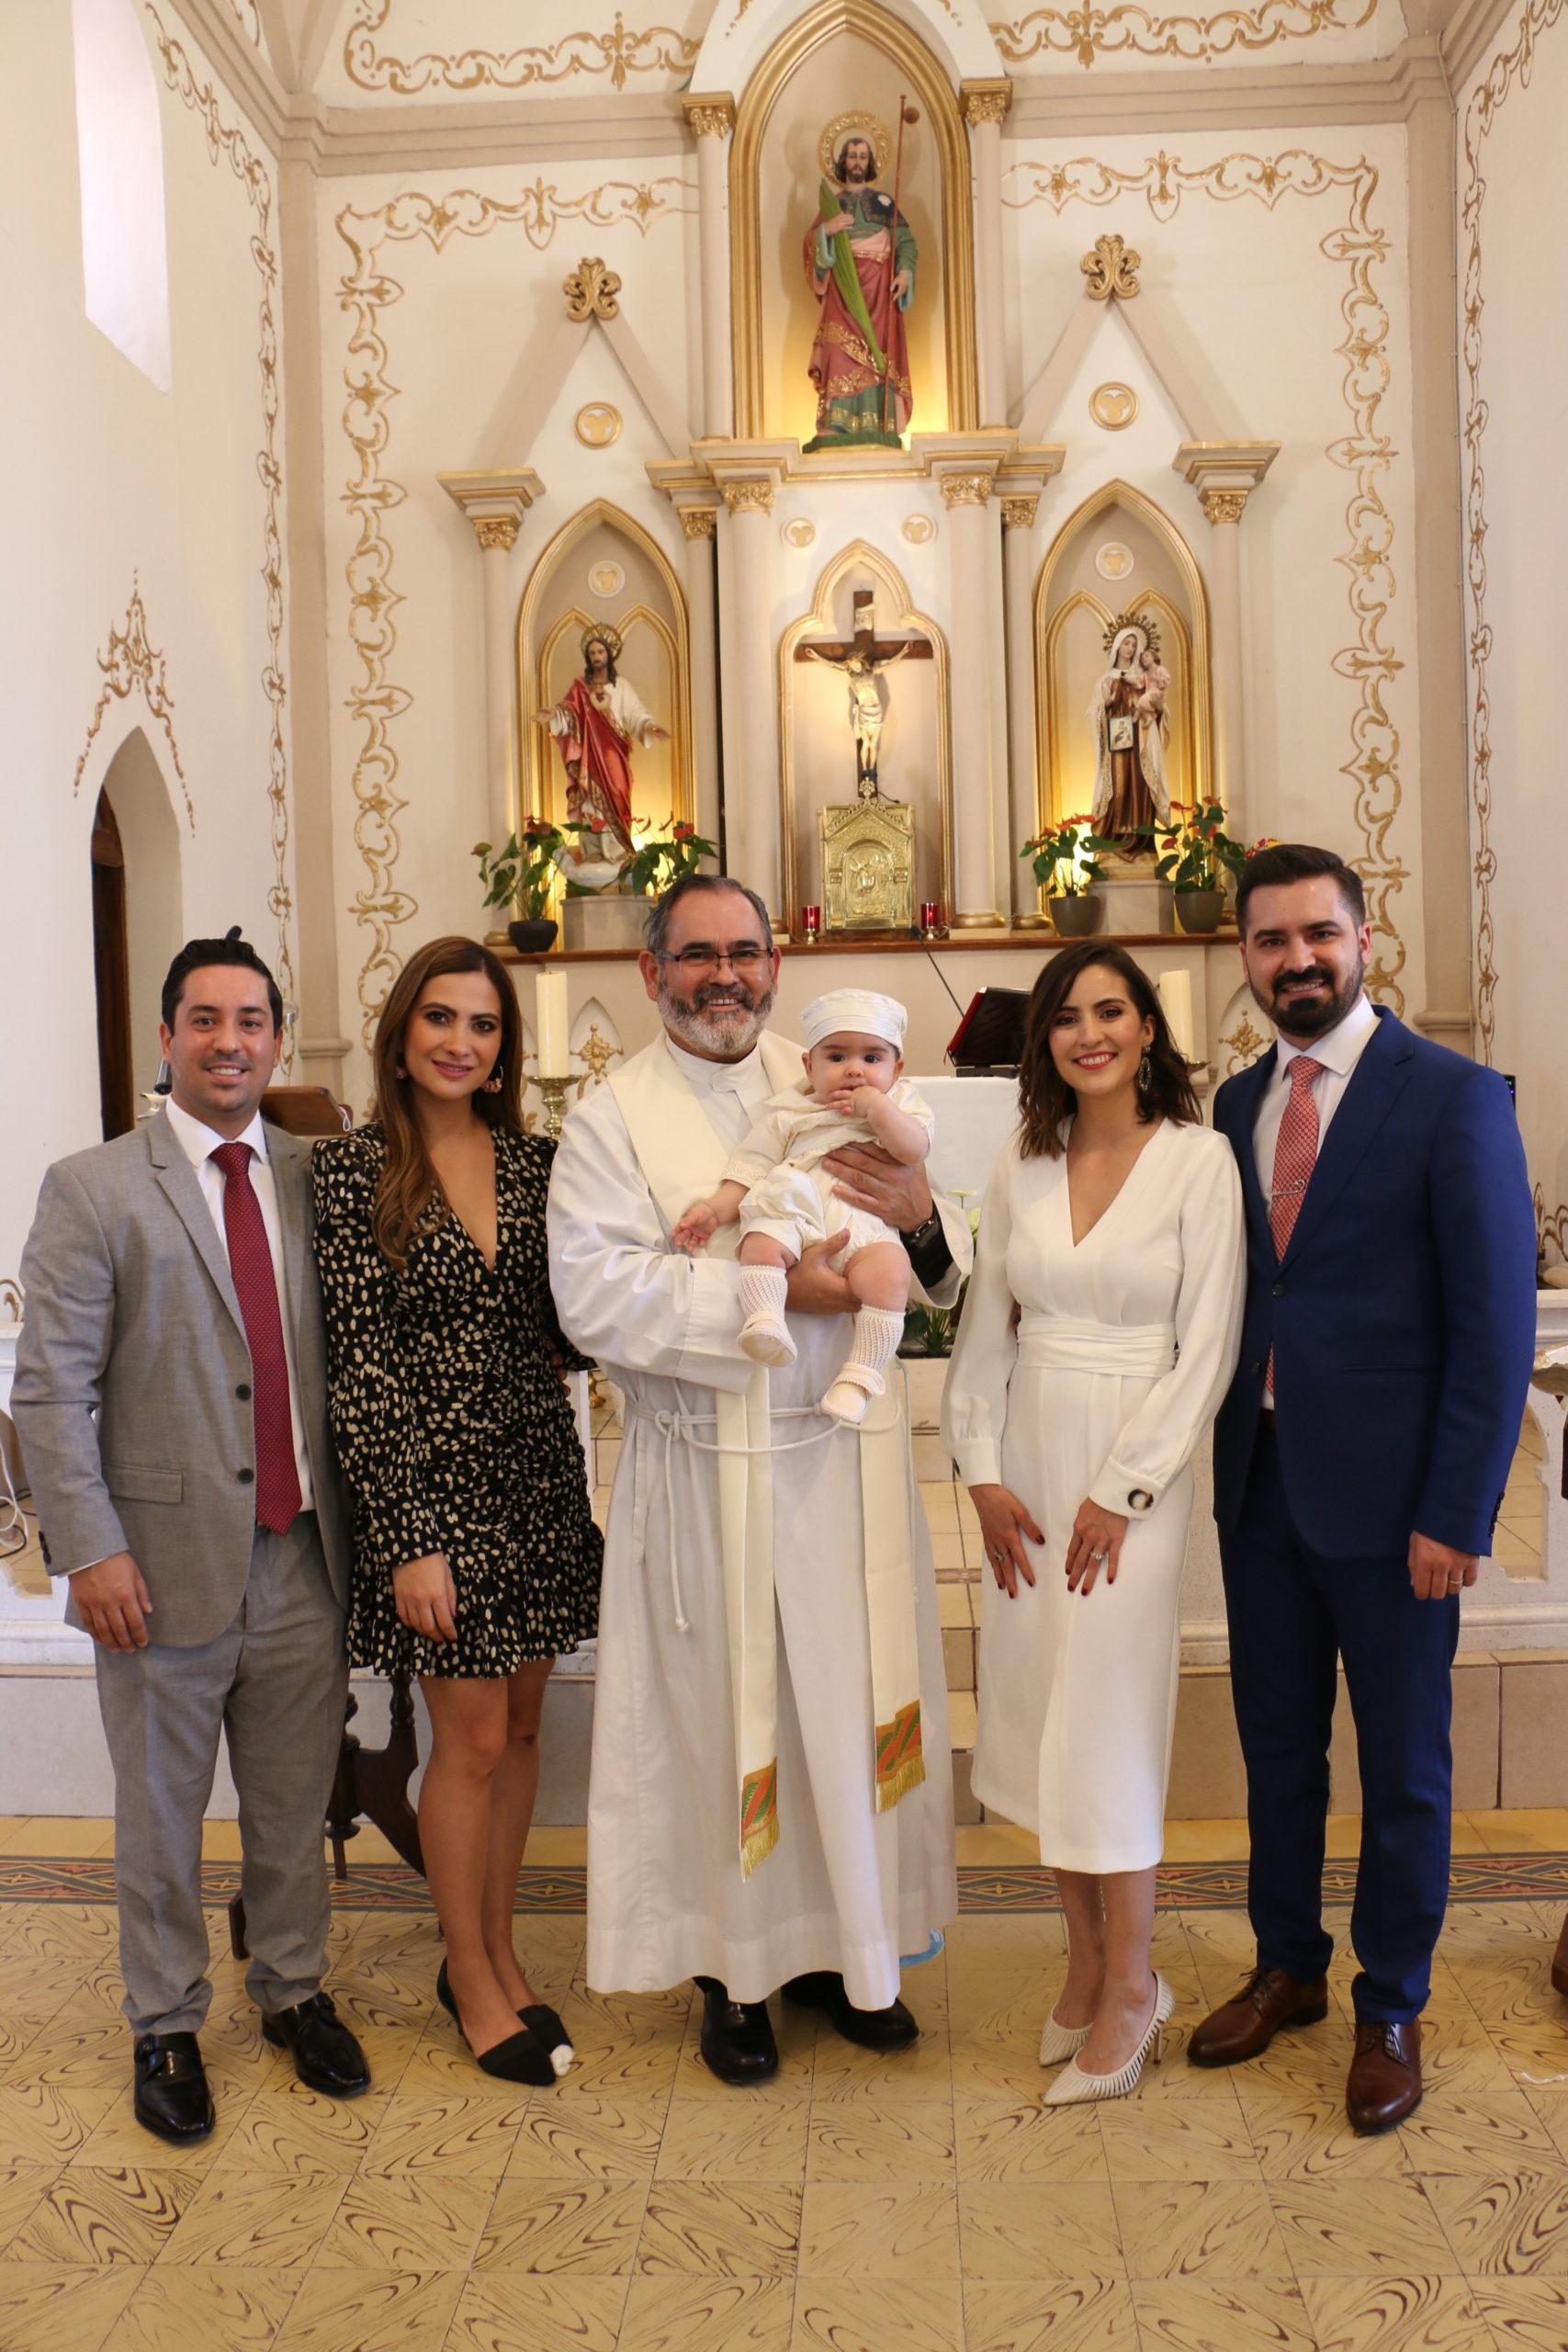 Fernando López, Sofía González, P. Fernando Torres L.C, Jorge, Verónica Mellado y Jorge Alanís.